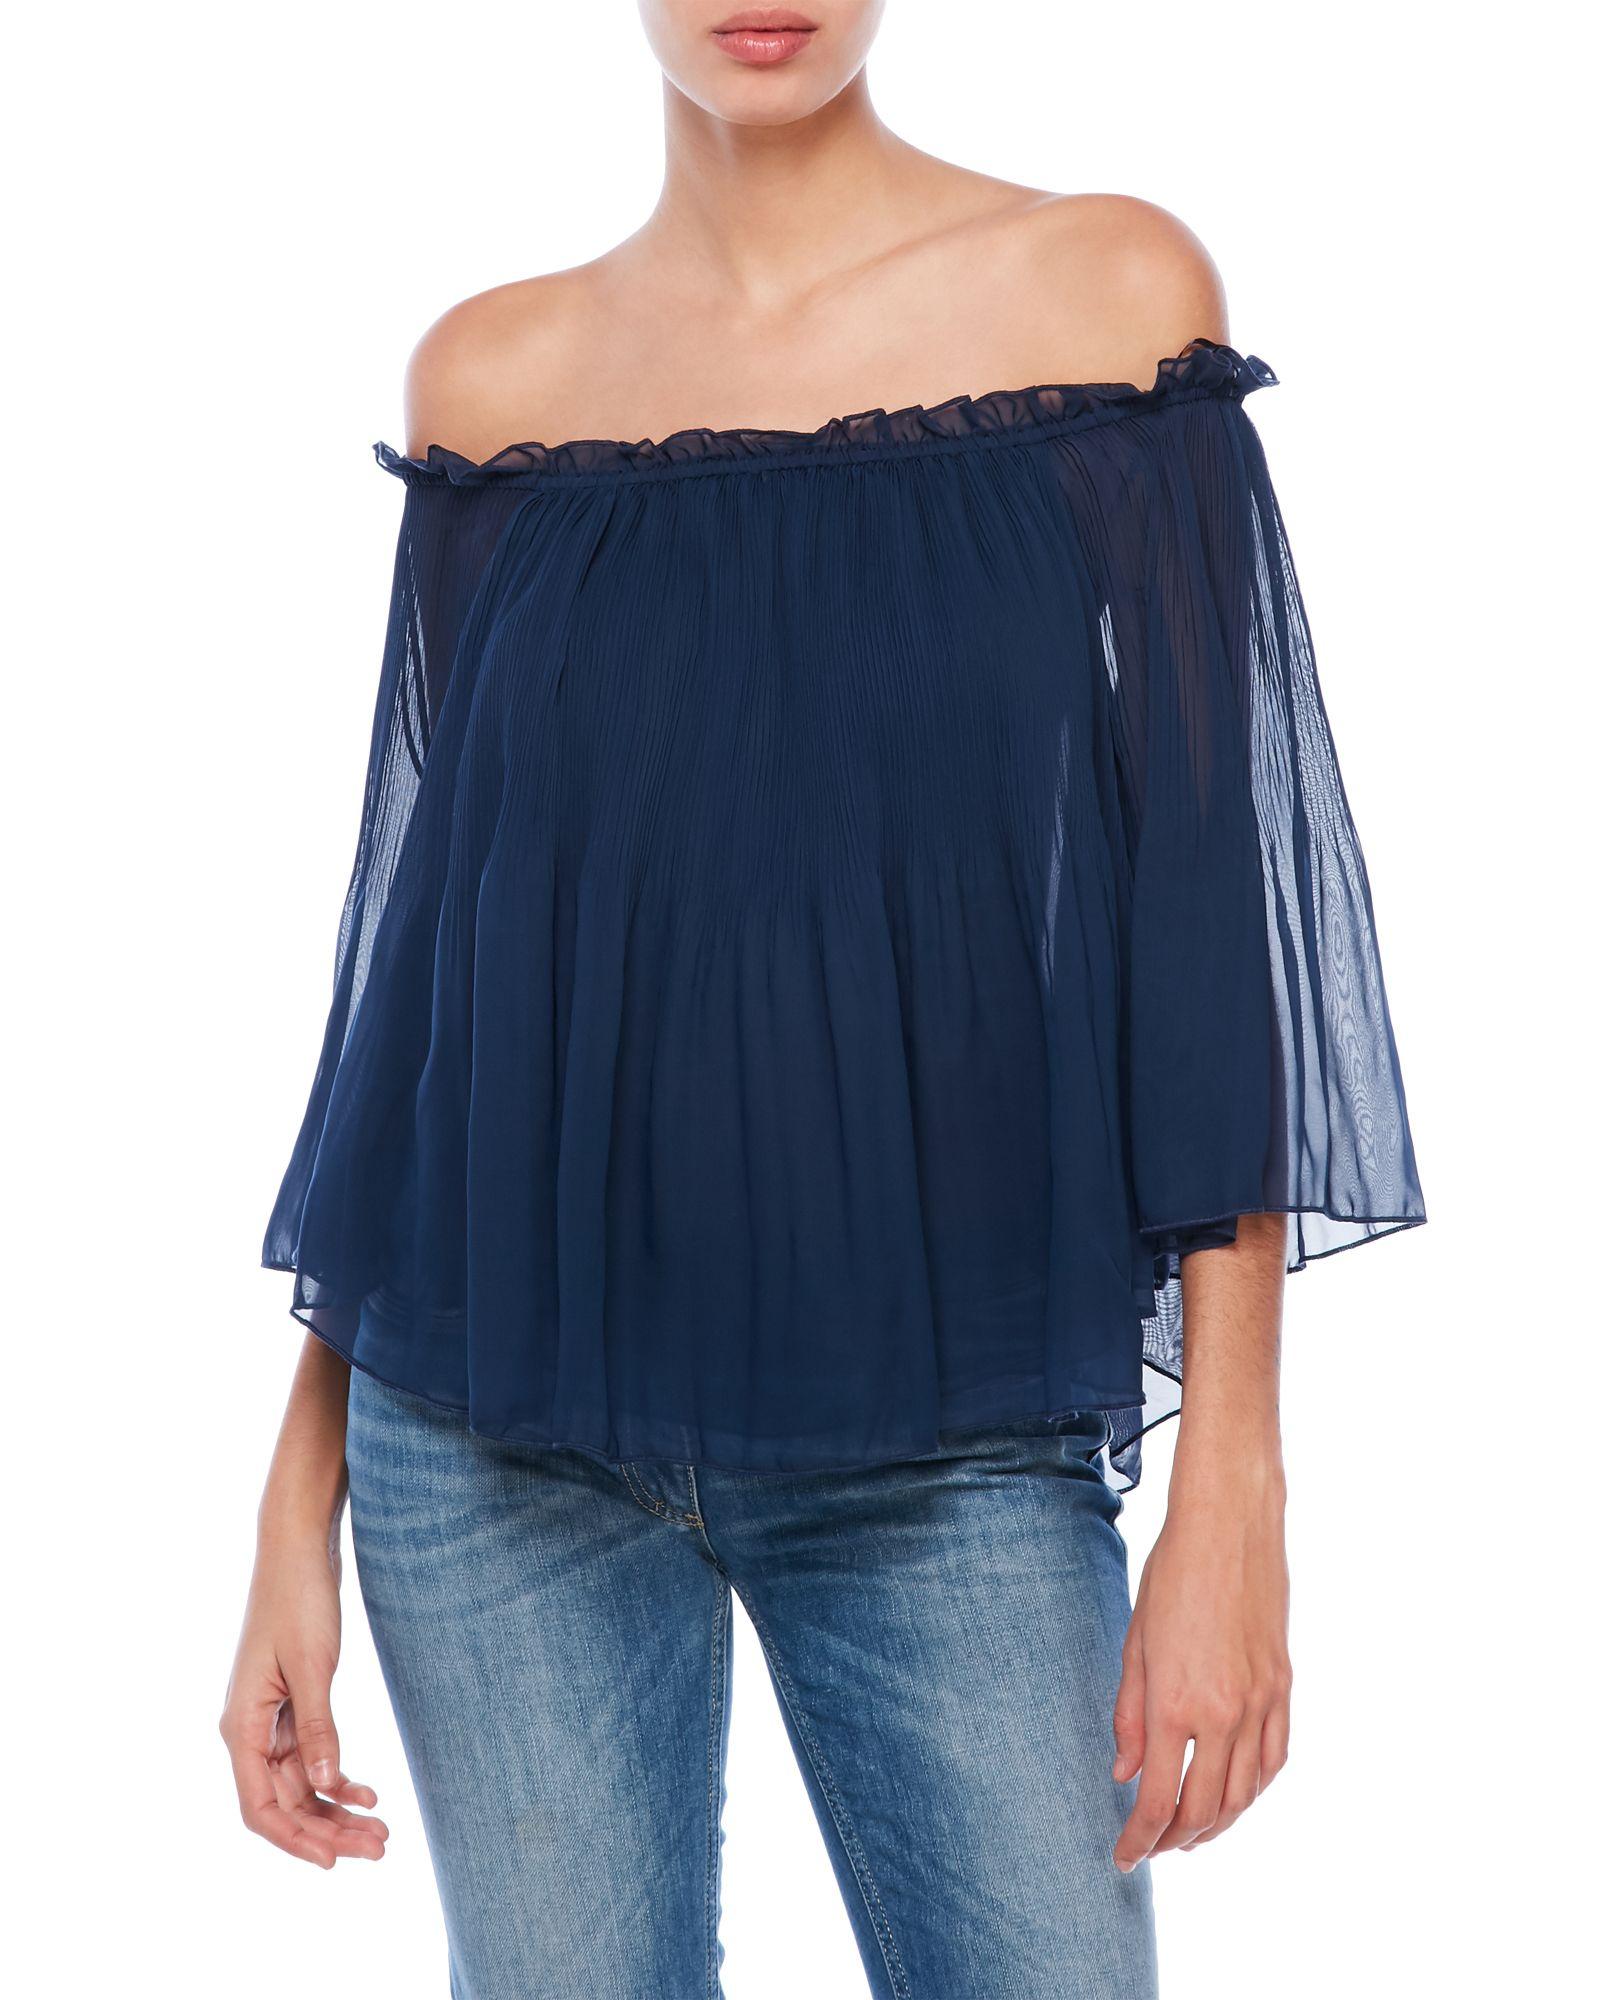 Ladies Chiffon Gypsy Boho Sheer 3//4 Sleeve Off Shoulder Womens Top Plus Size